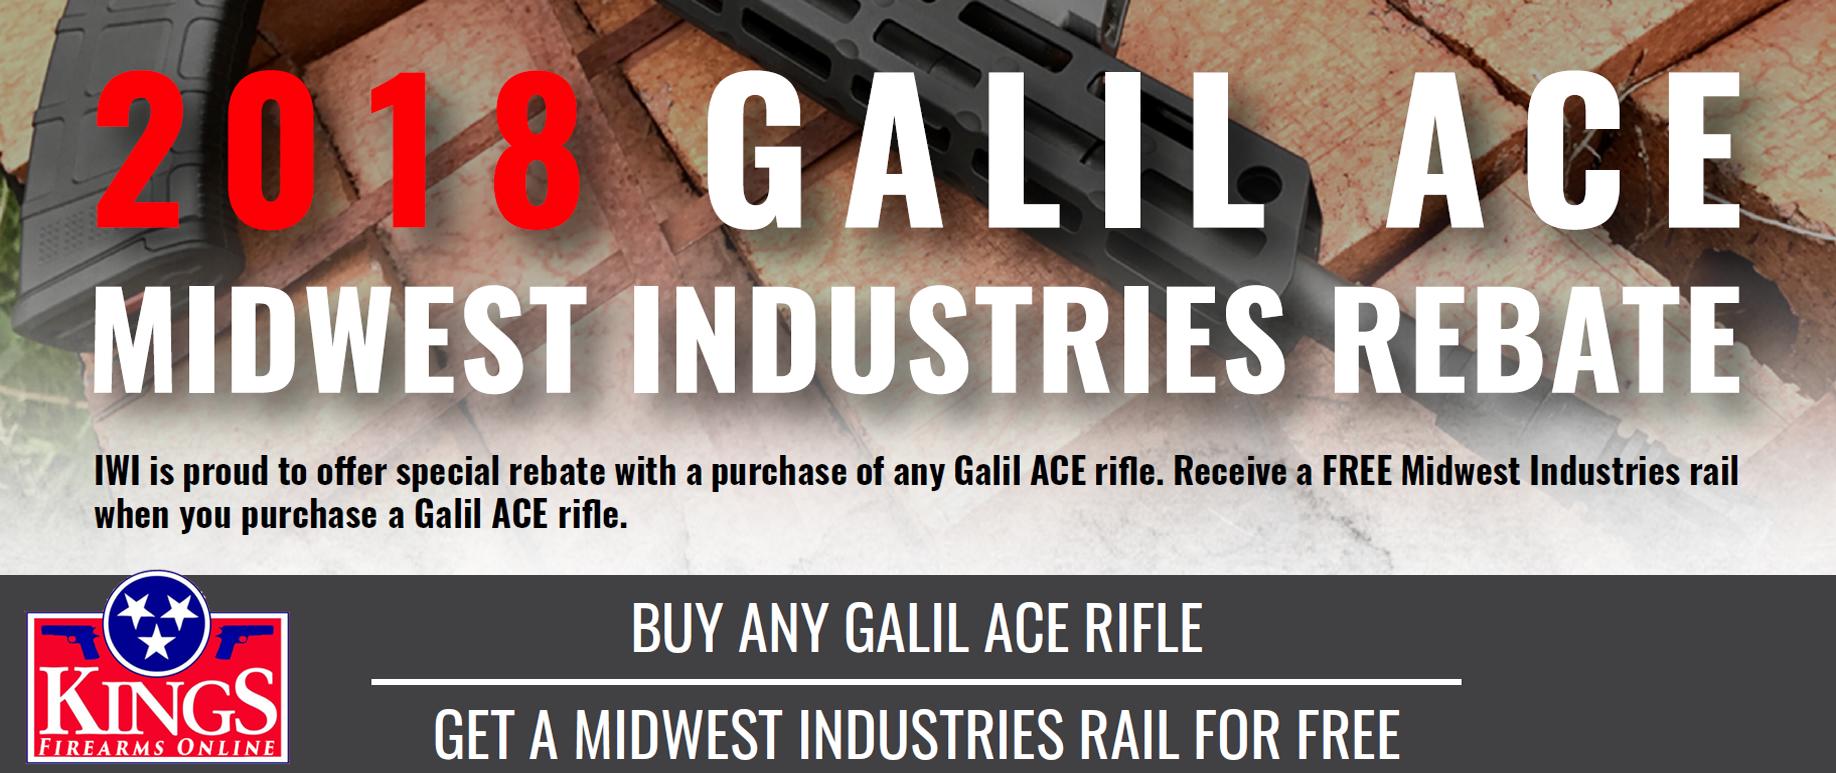 https://www.kingsfirearmsonline.com/catalog/rifles/semi-automatic-rifles?q=galil&sort=